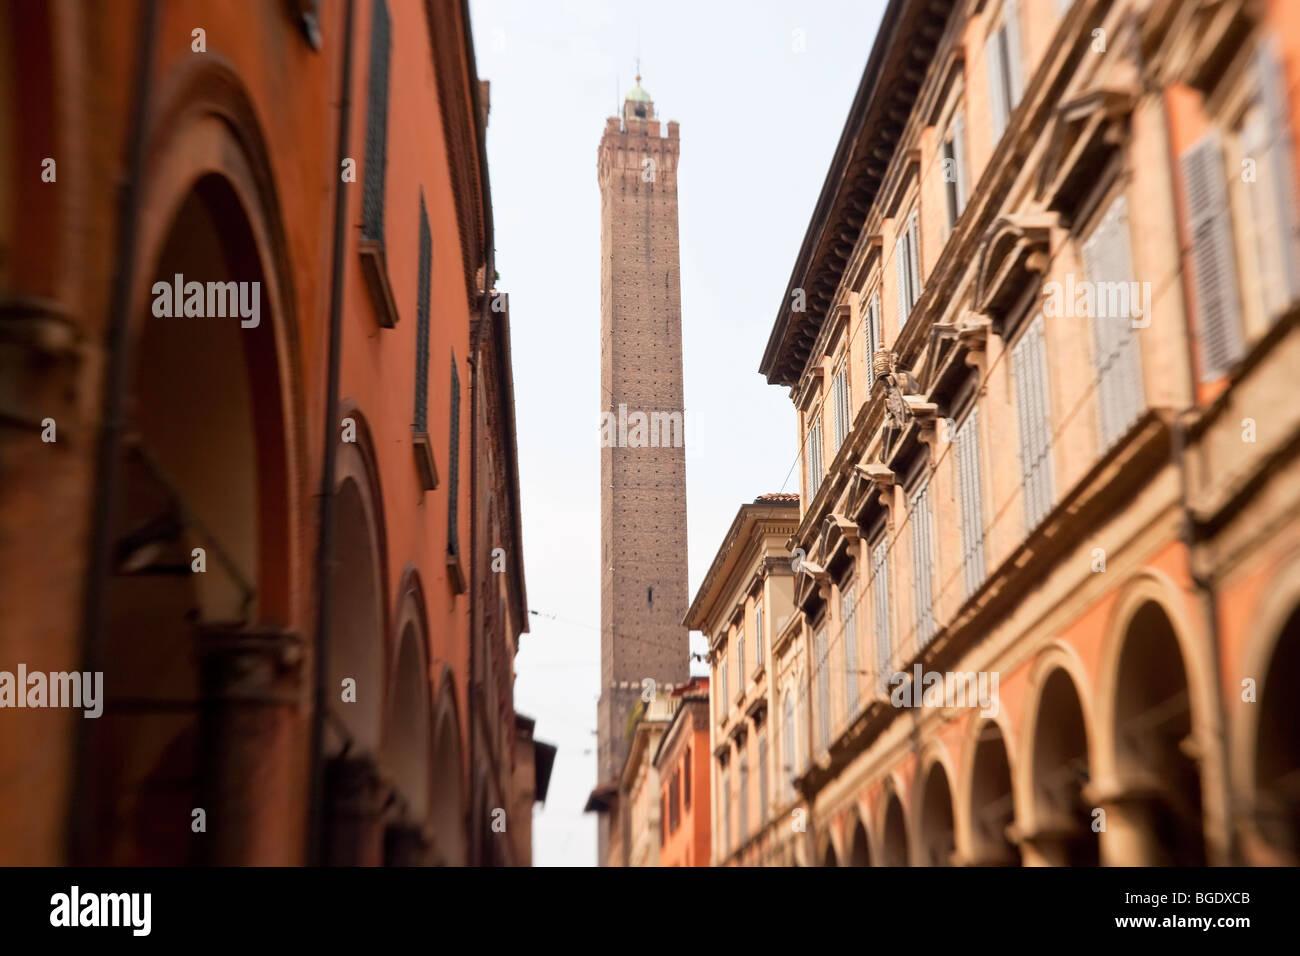 Le Du Torri Tower & street, Bologna, Emilia Romagna, Italy - Stock Image